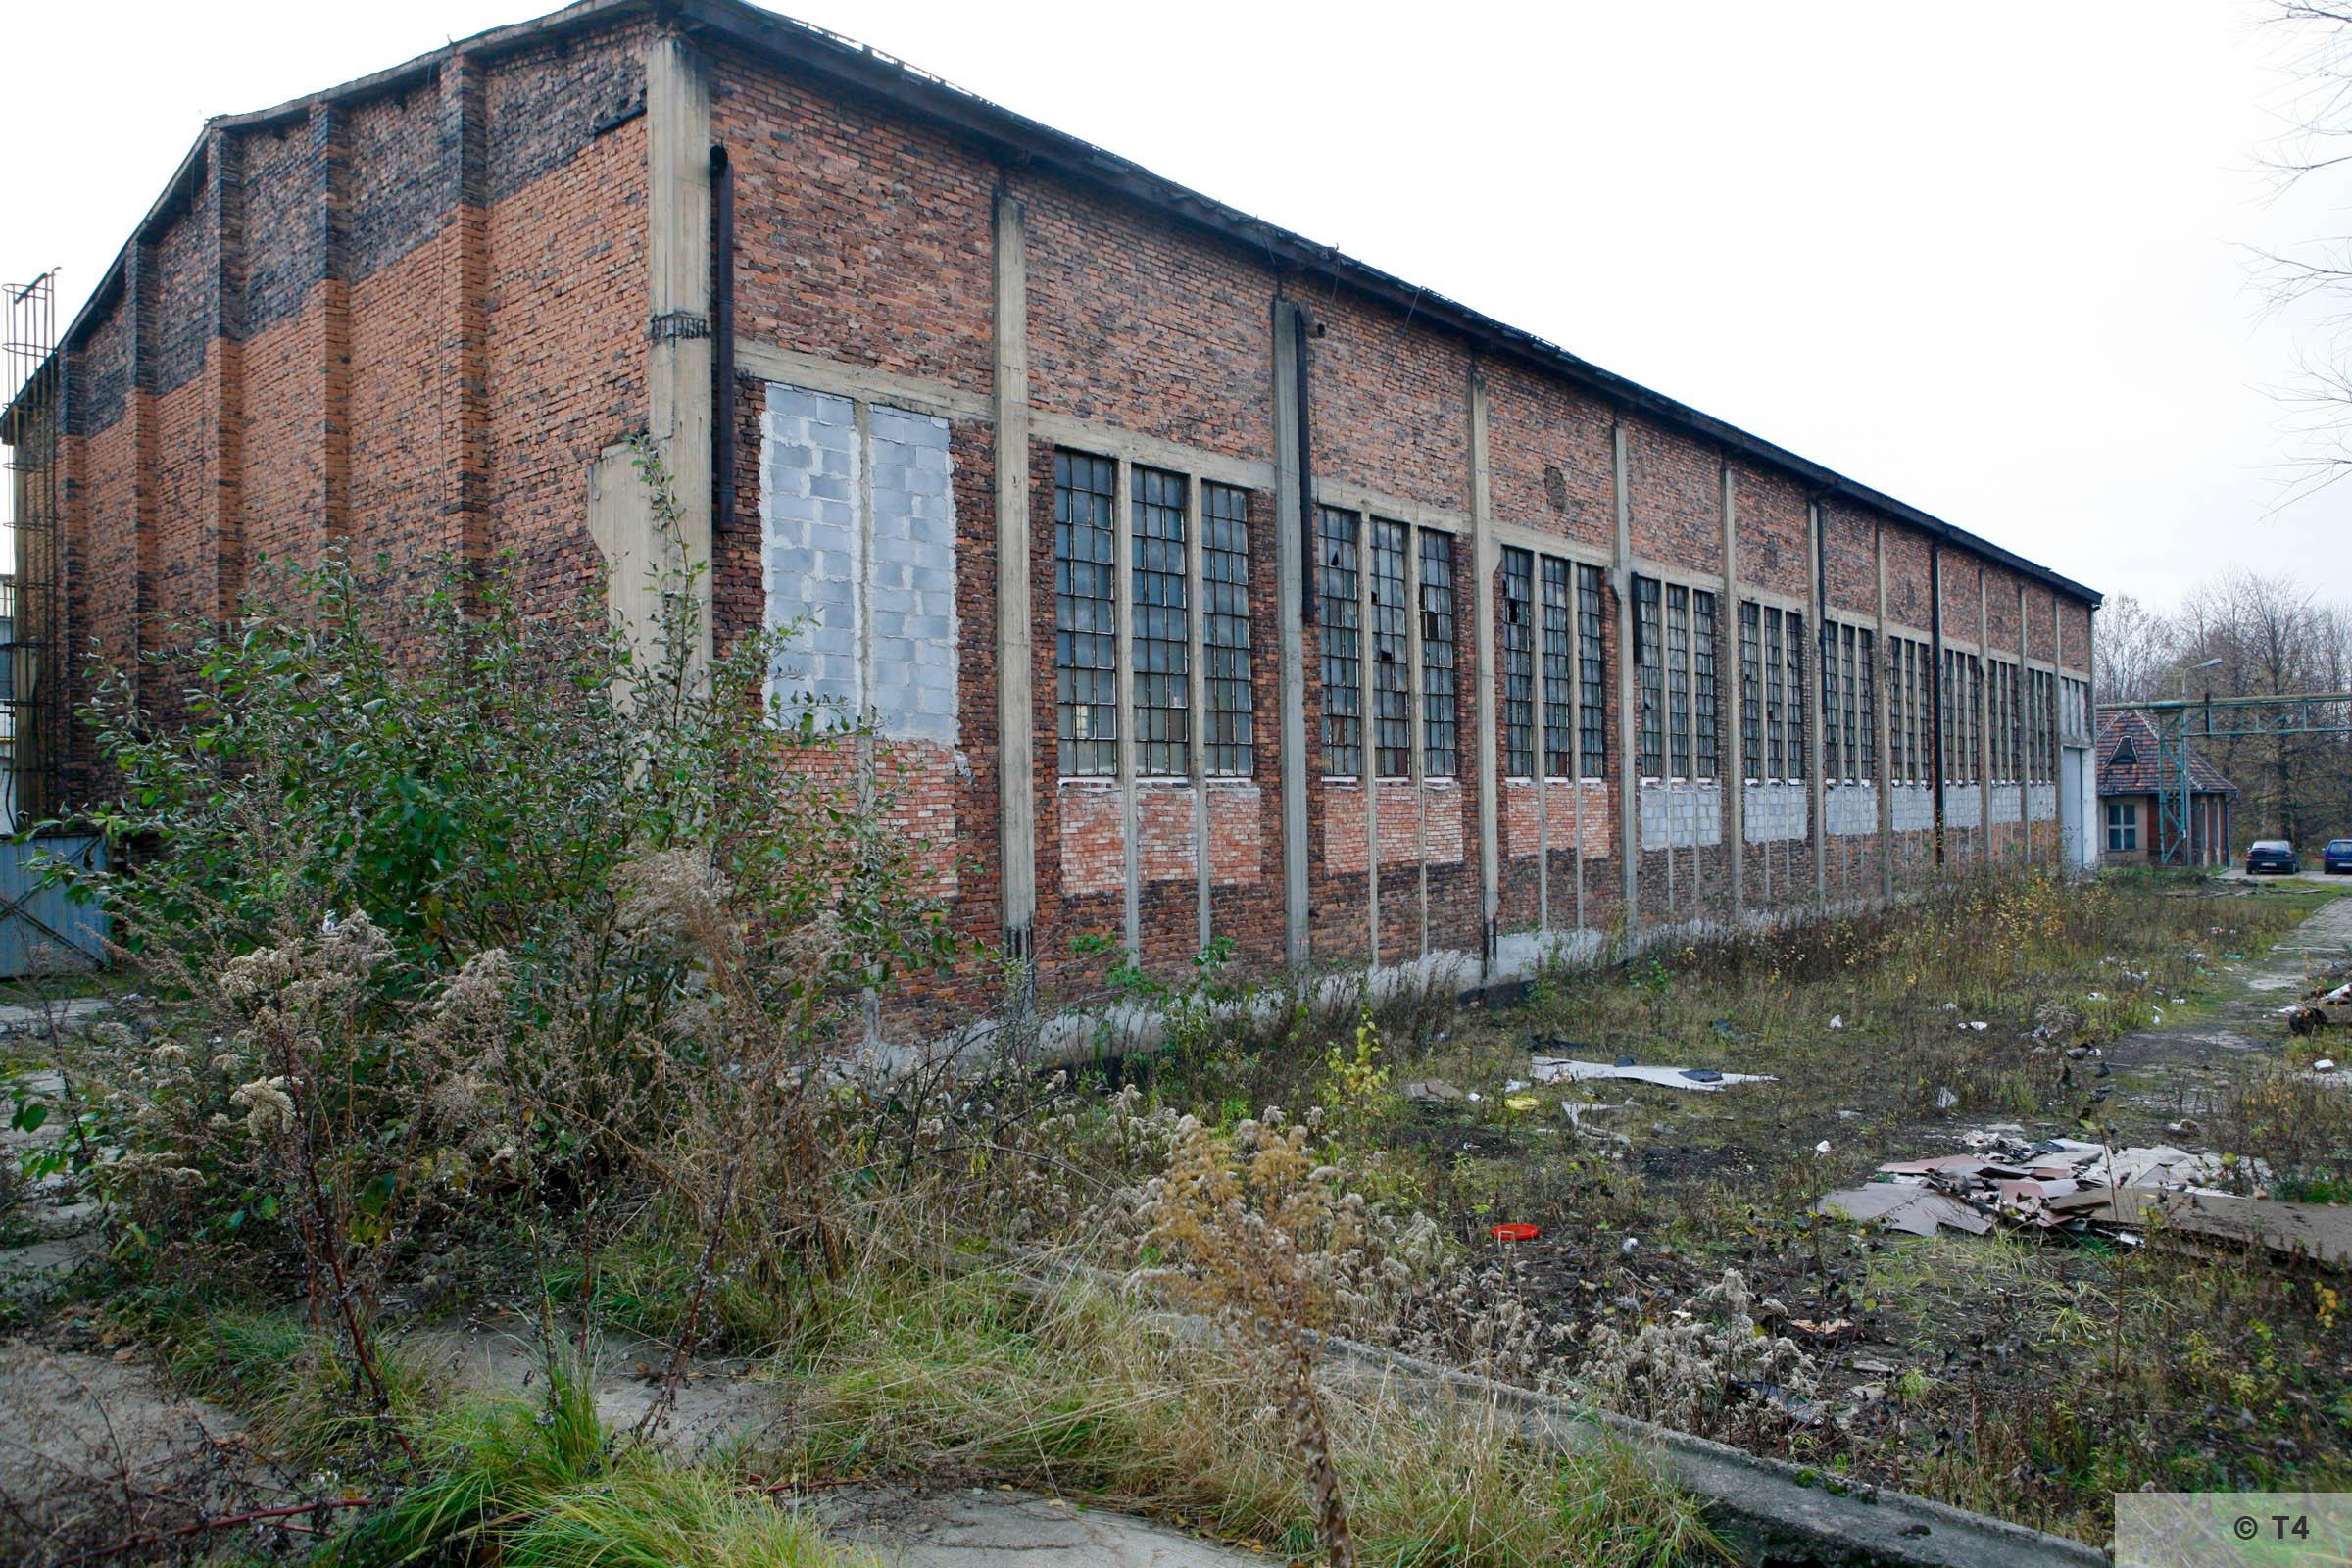 Zygmunt steel works. 2006 T4 4752